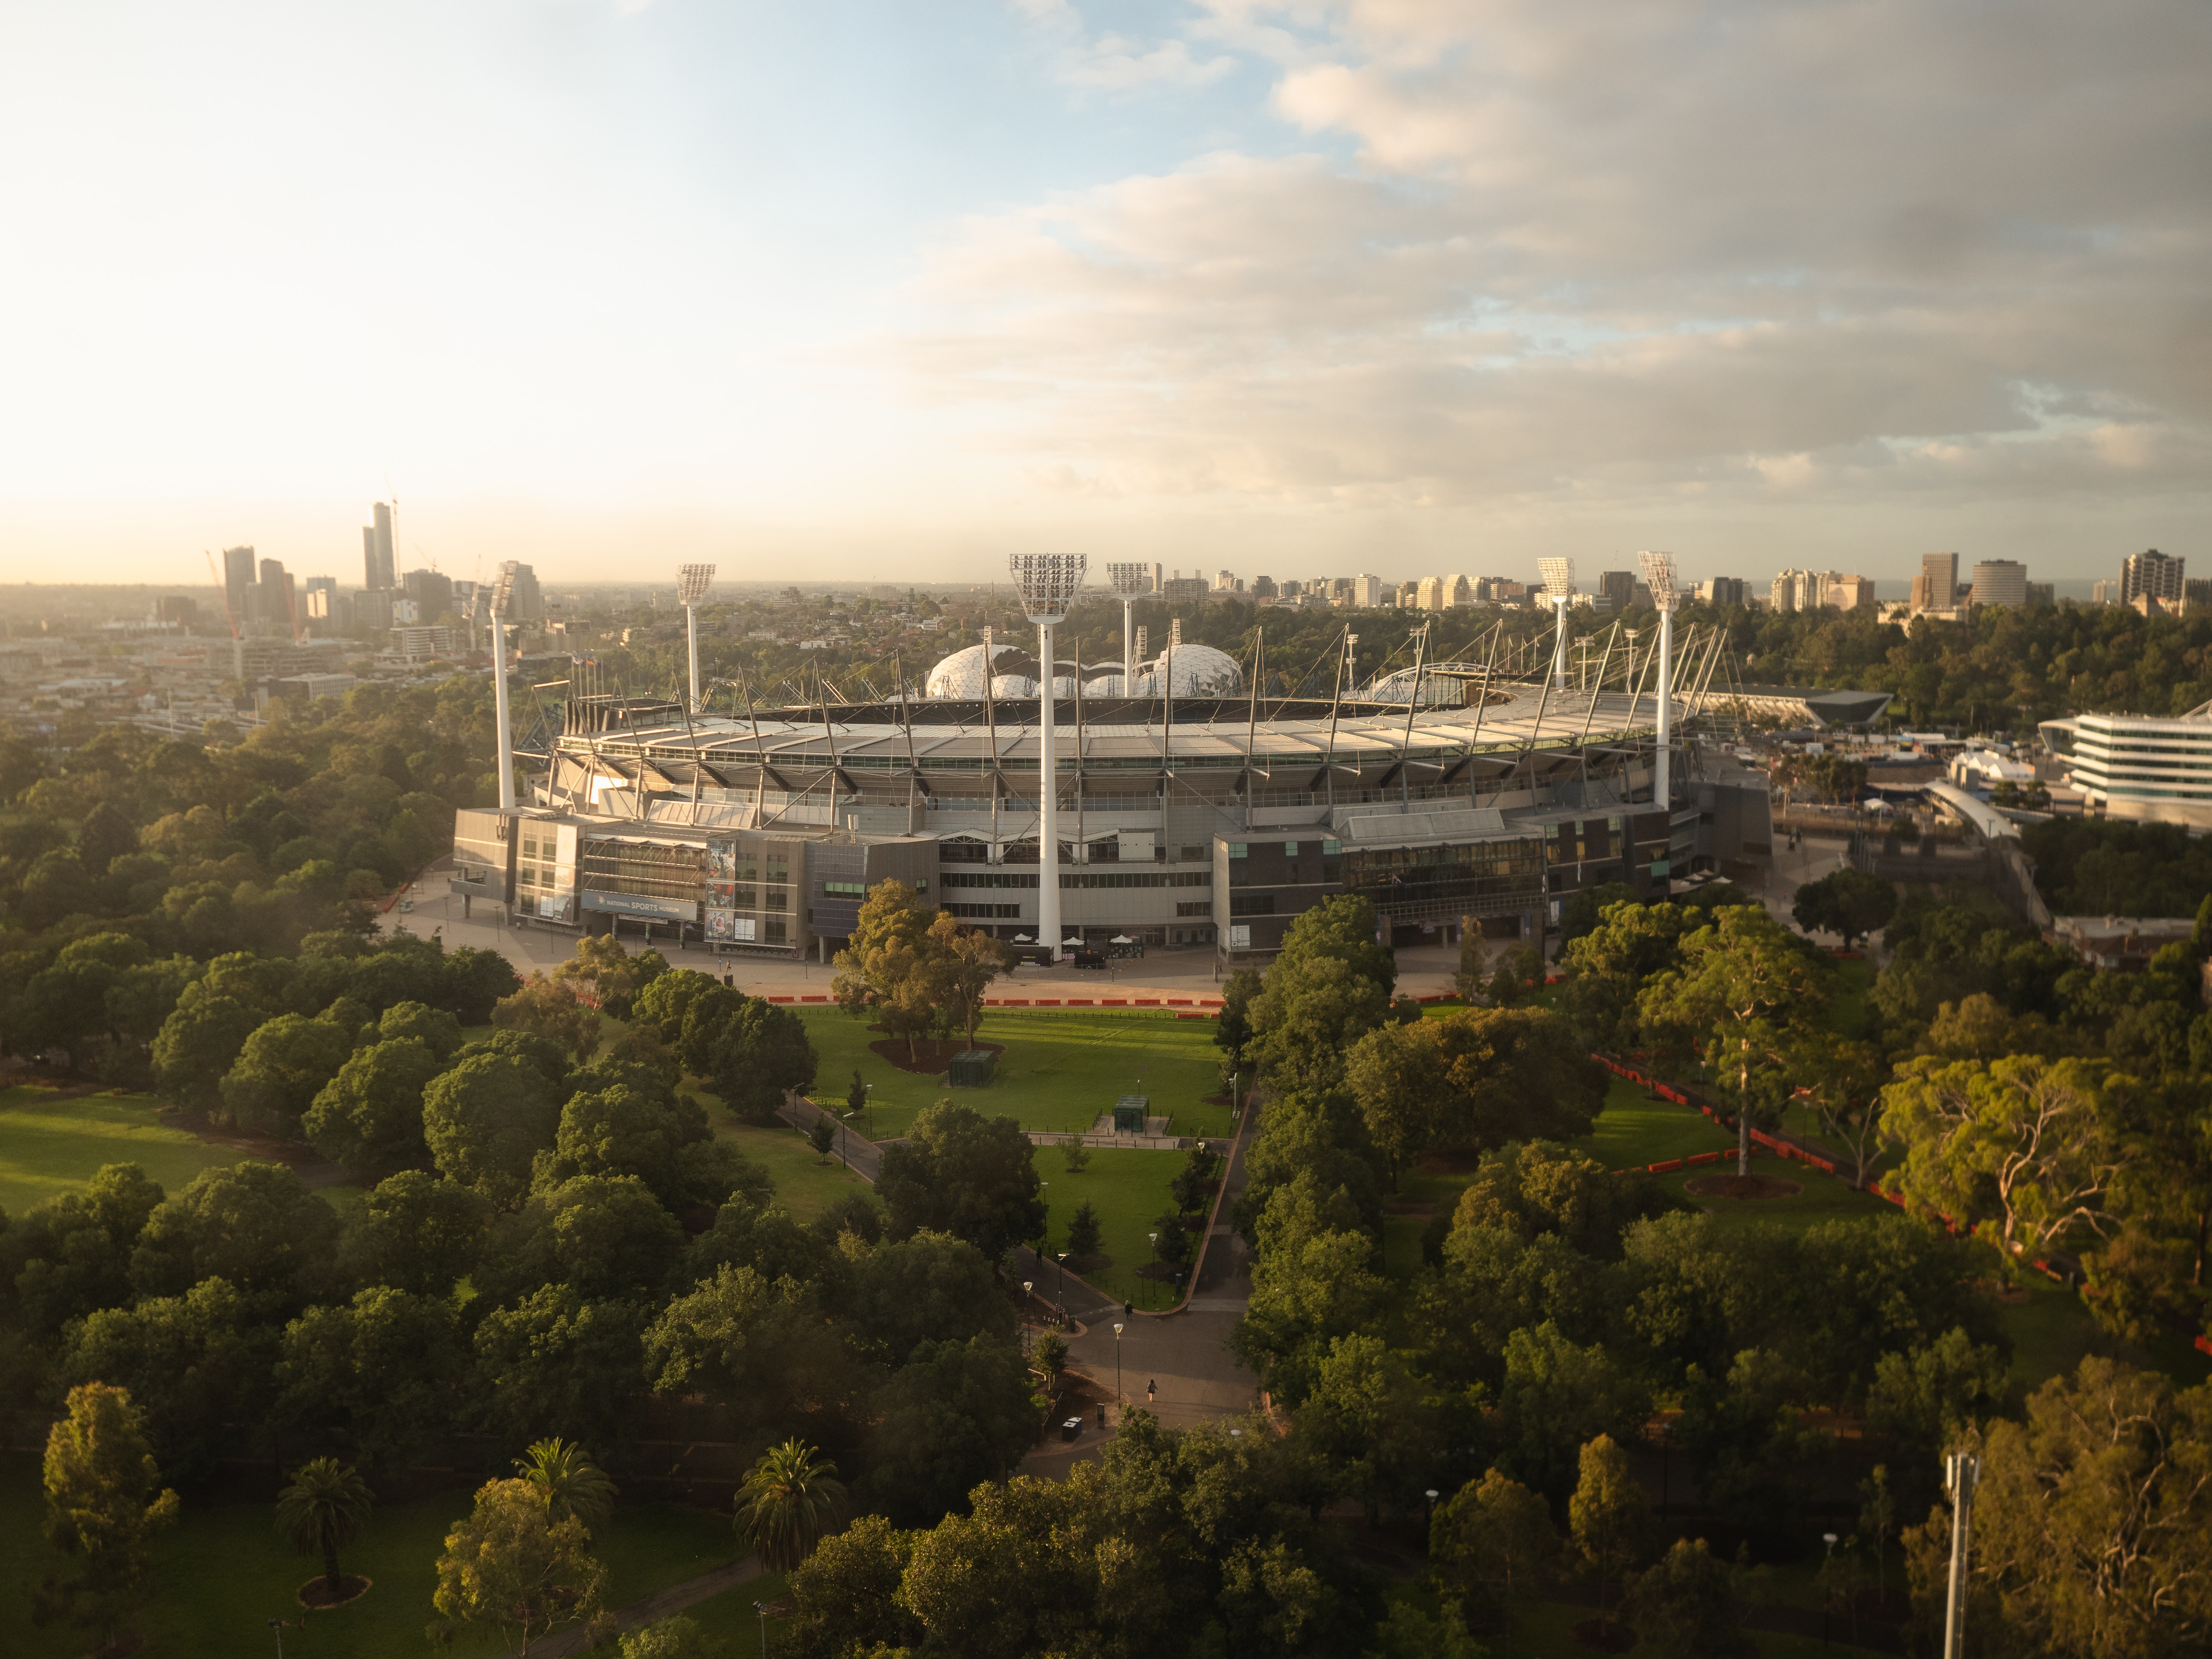 Morning sunrise of the Melbourne Cricket Ground (MCG)